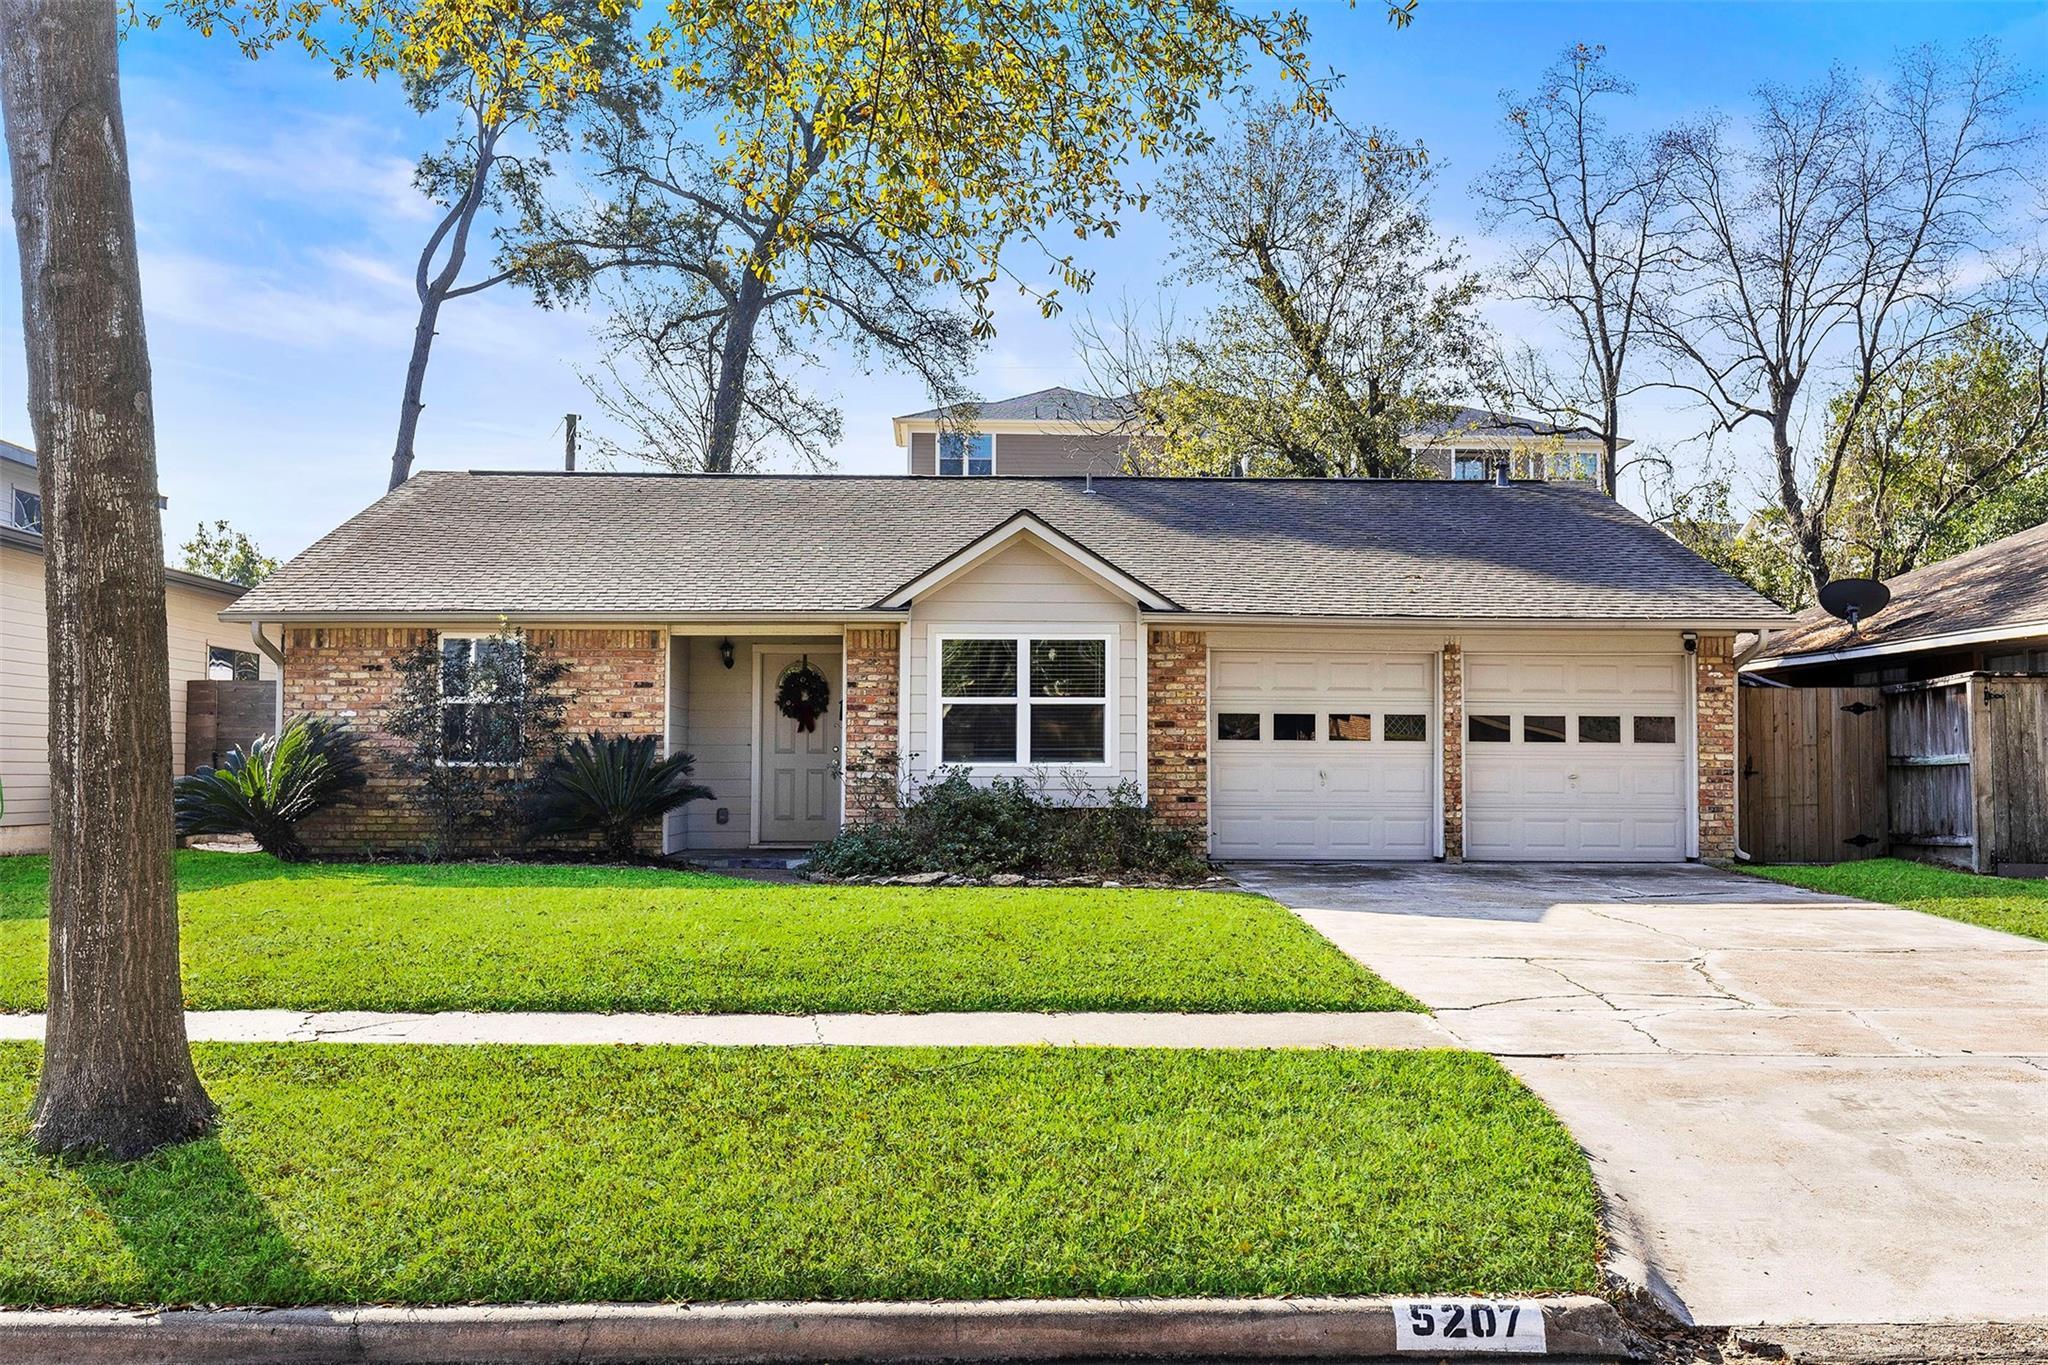 5207 Lamonte Lane Property Photo - Houston, TX real estate listing